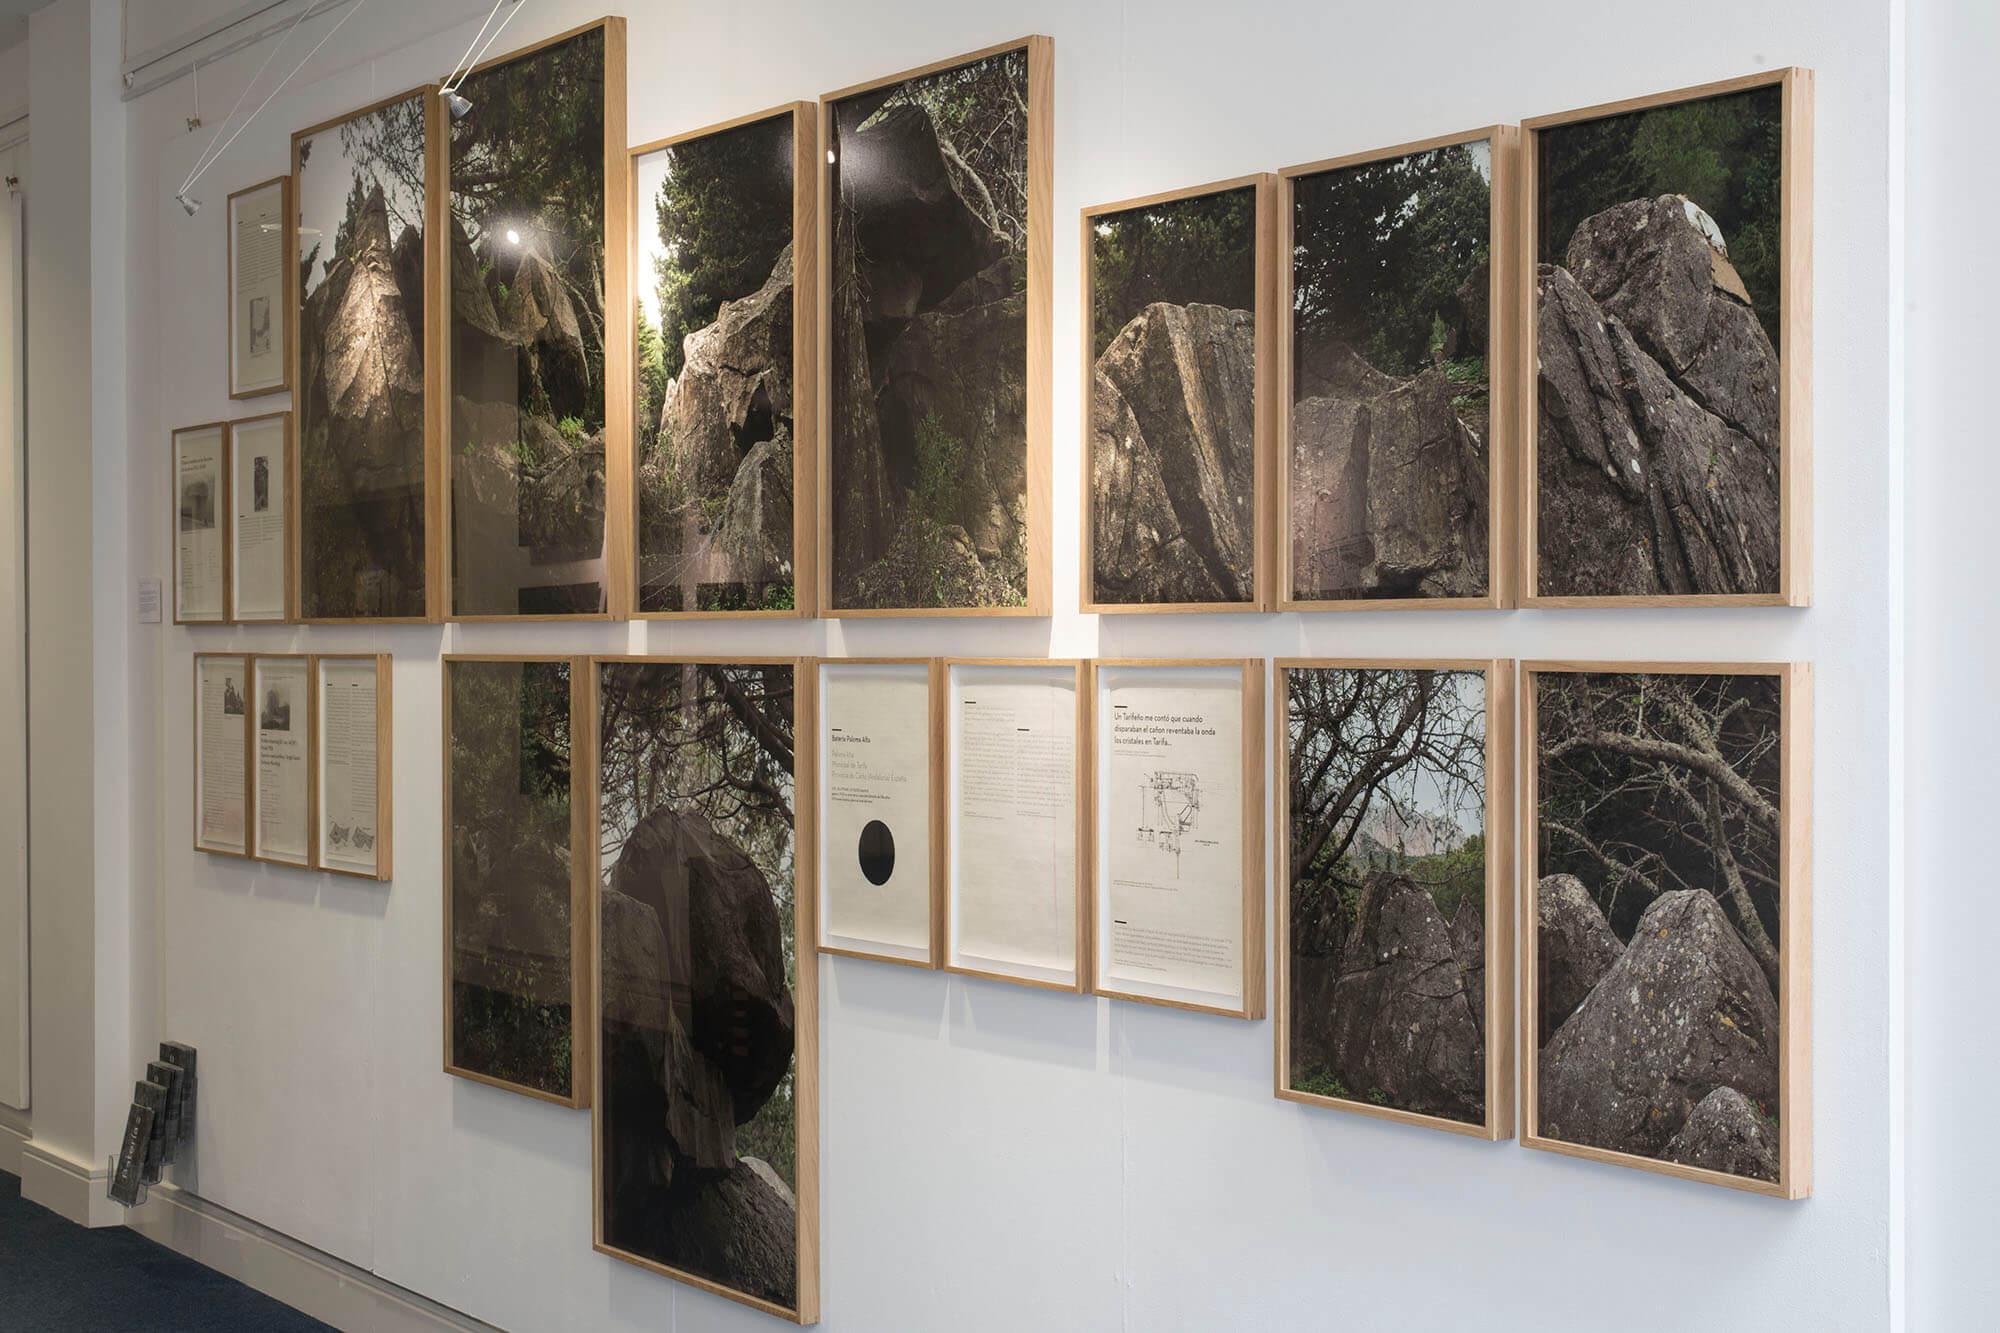 Daniela Friebel's exhibition at Format17